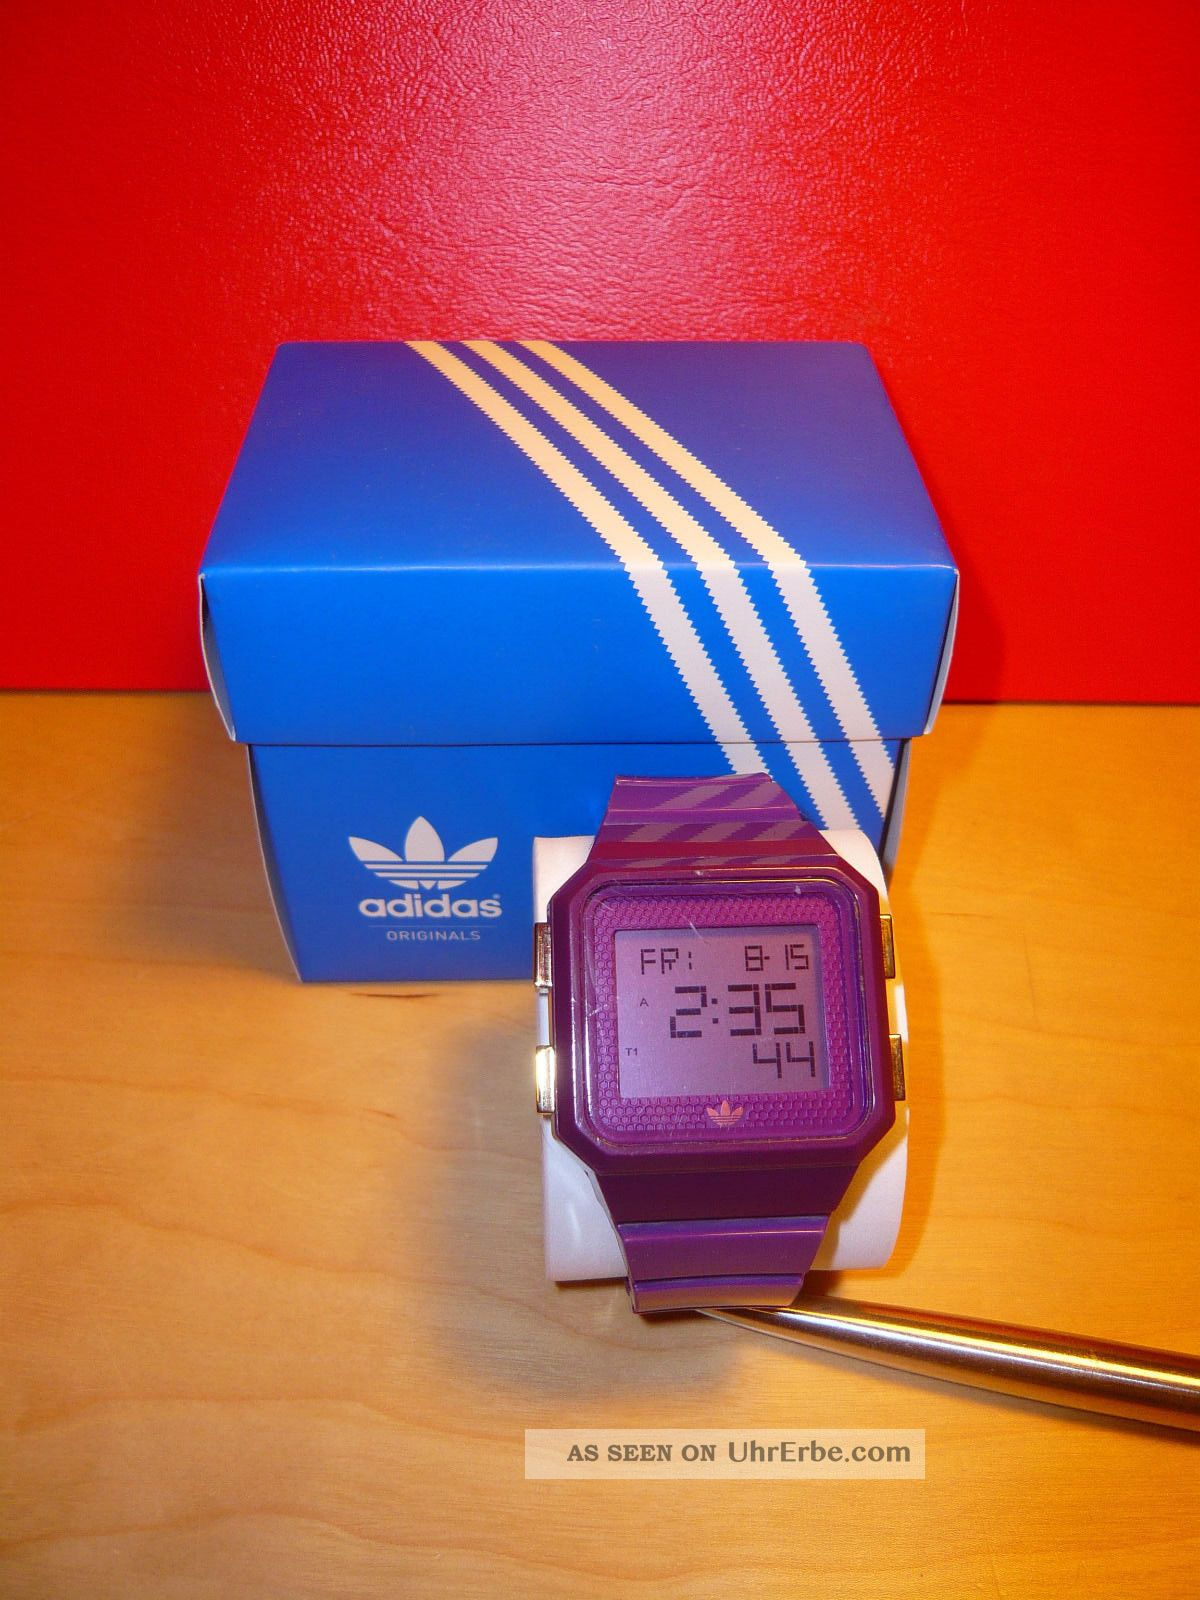 Adidas Originals Uhr Adh 4038 Baujahr 2012 Armbanduhren Bild